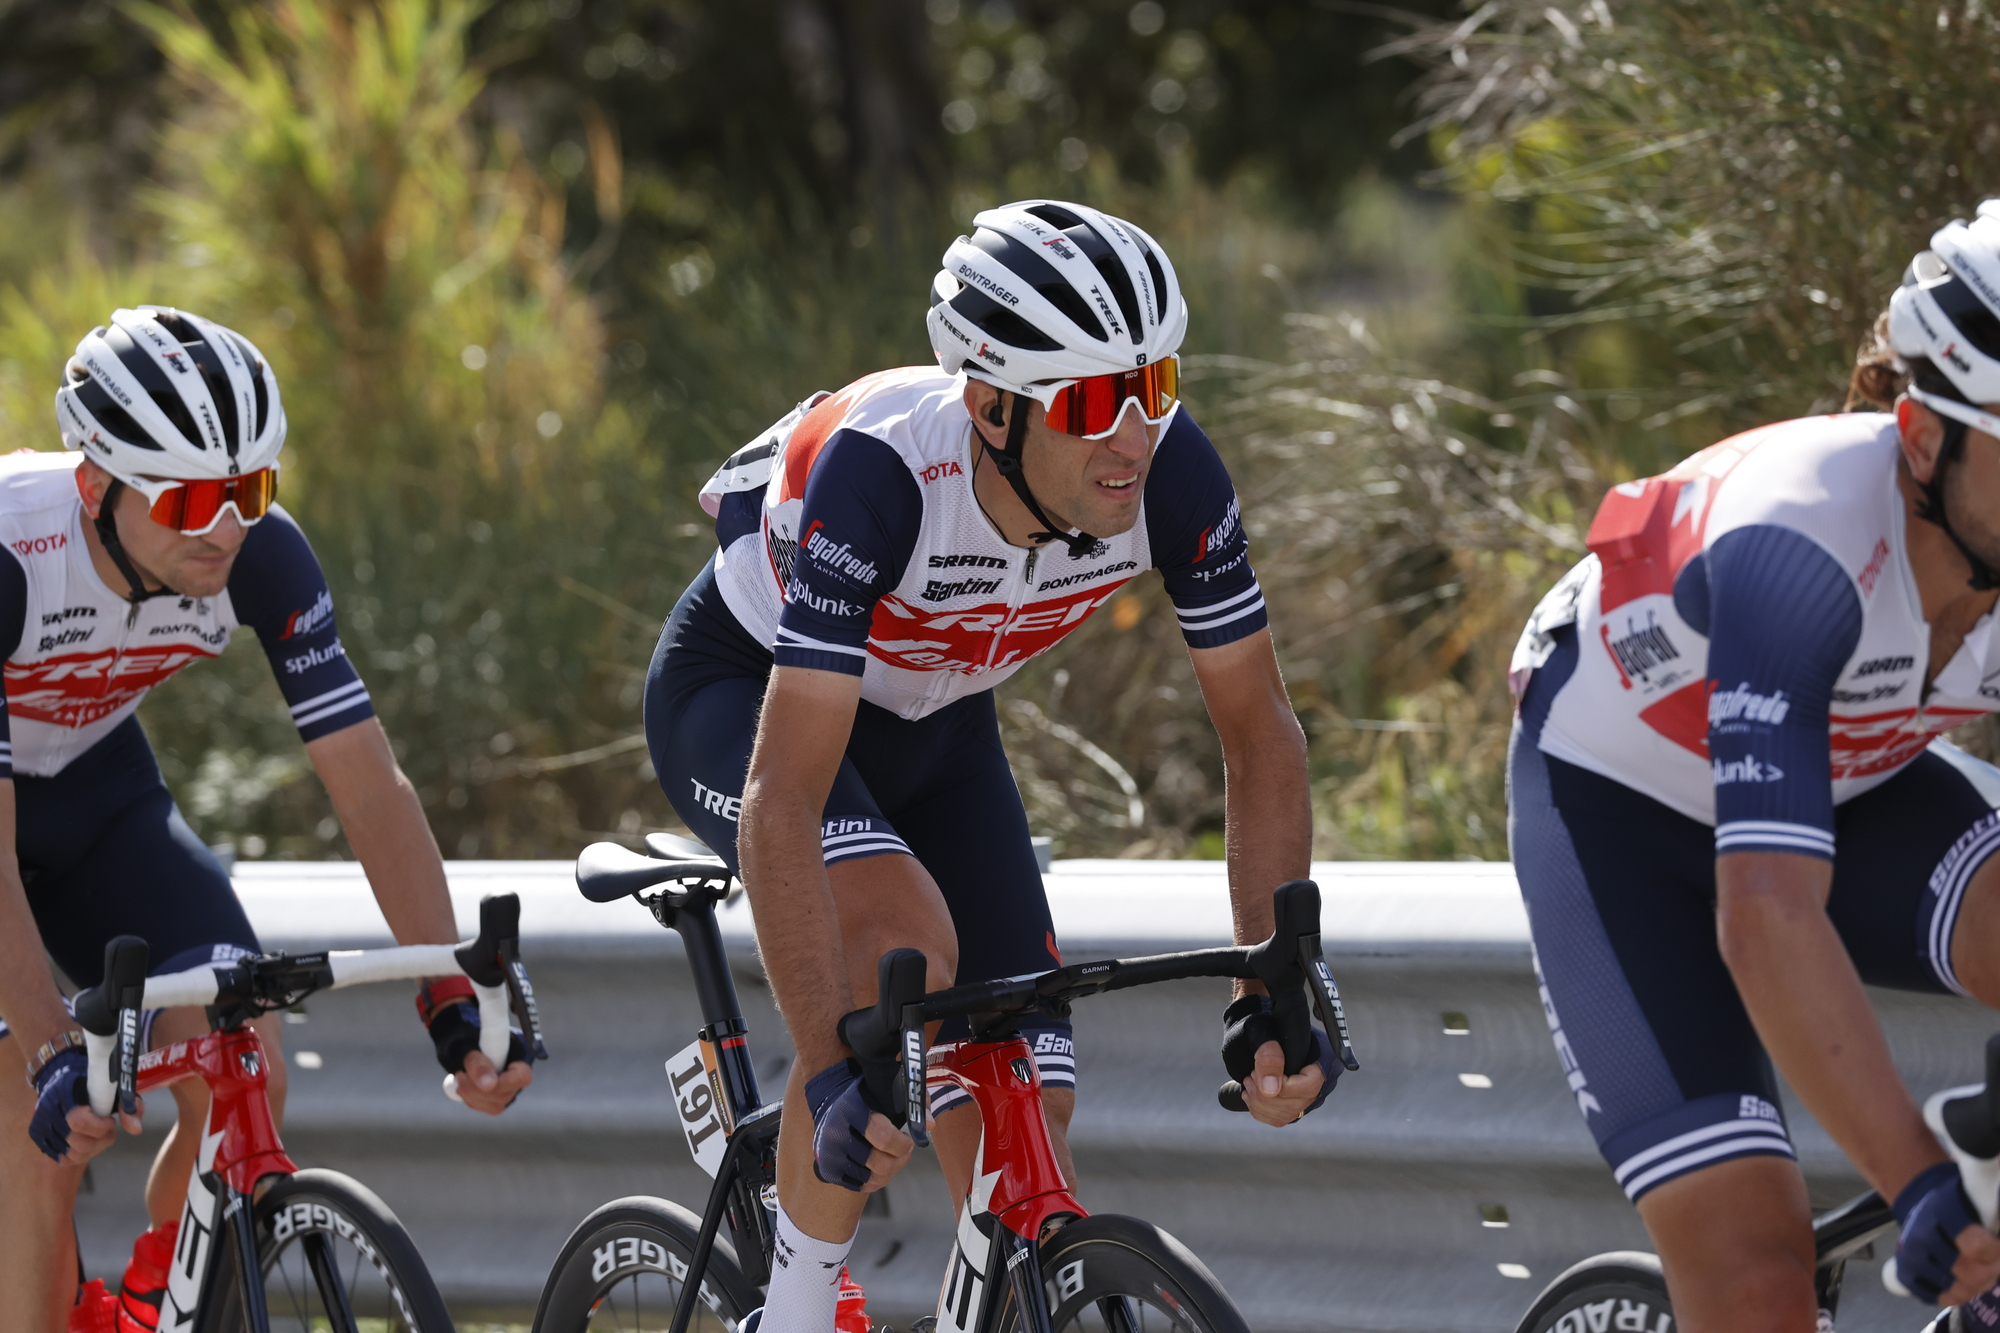 Giro dItalia 2020 103th Edition 6th stage Castrovillari Matera 188km 08102020 Vincenzo Nibali ITA Trek Segafredo photo Luca BettiniBettiniPhoto2020